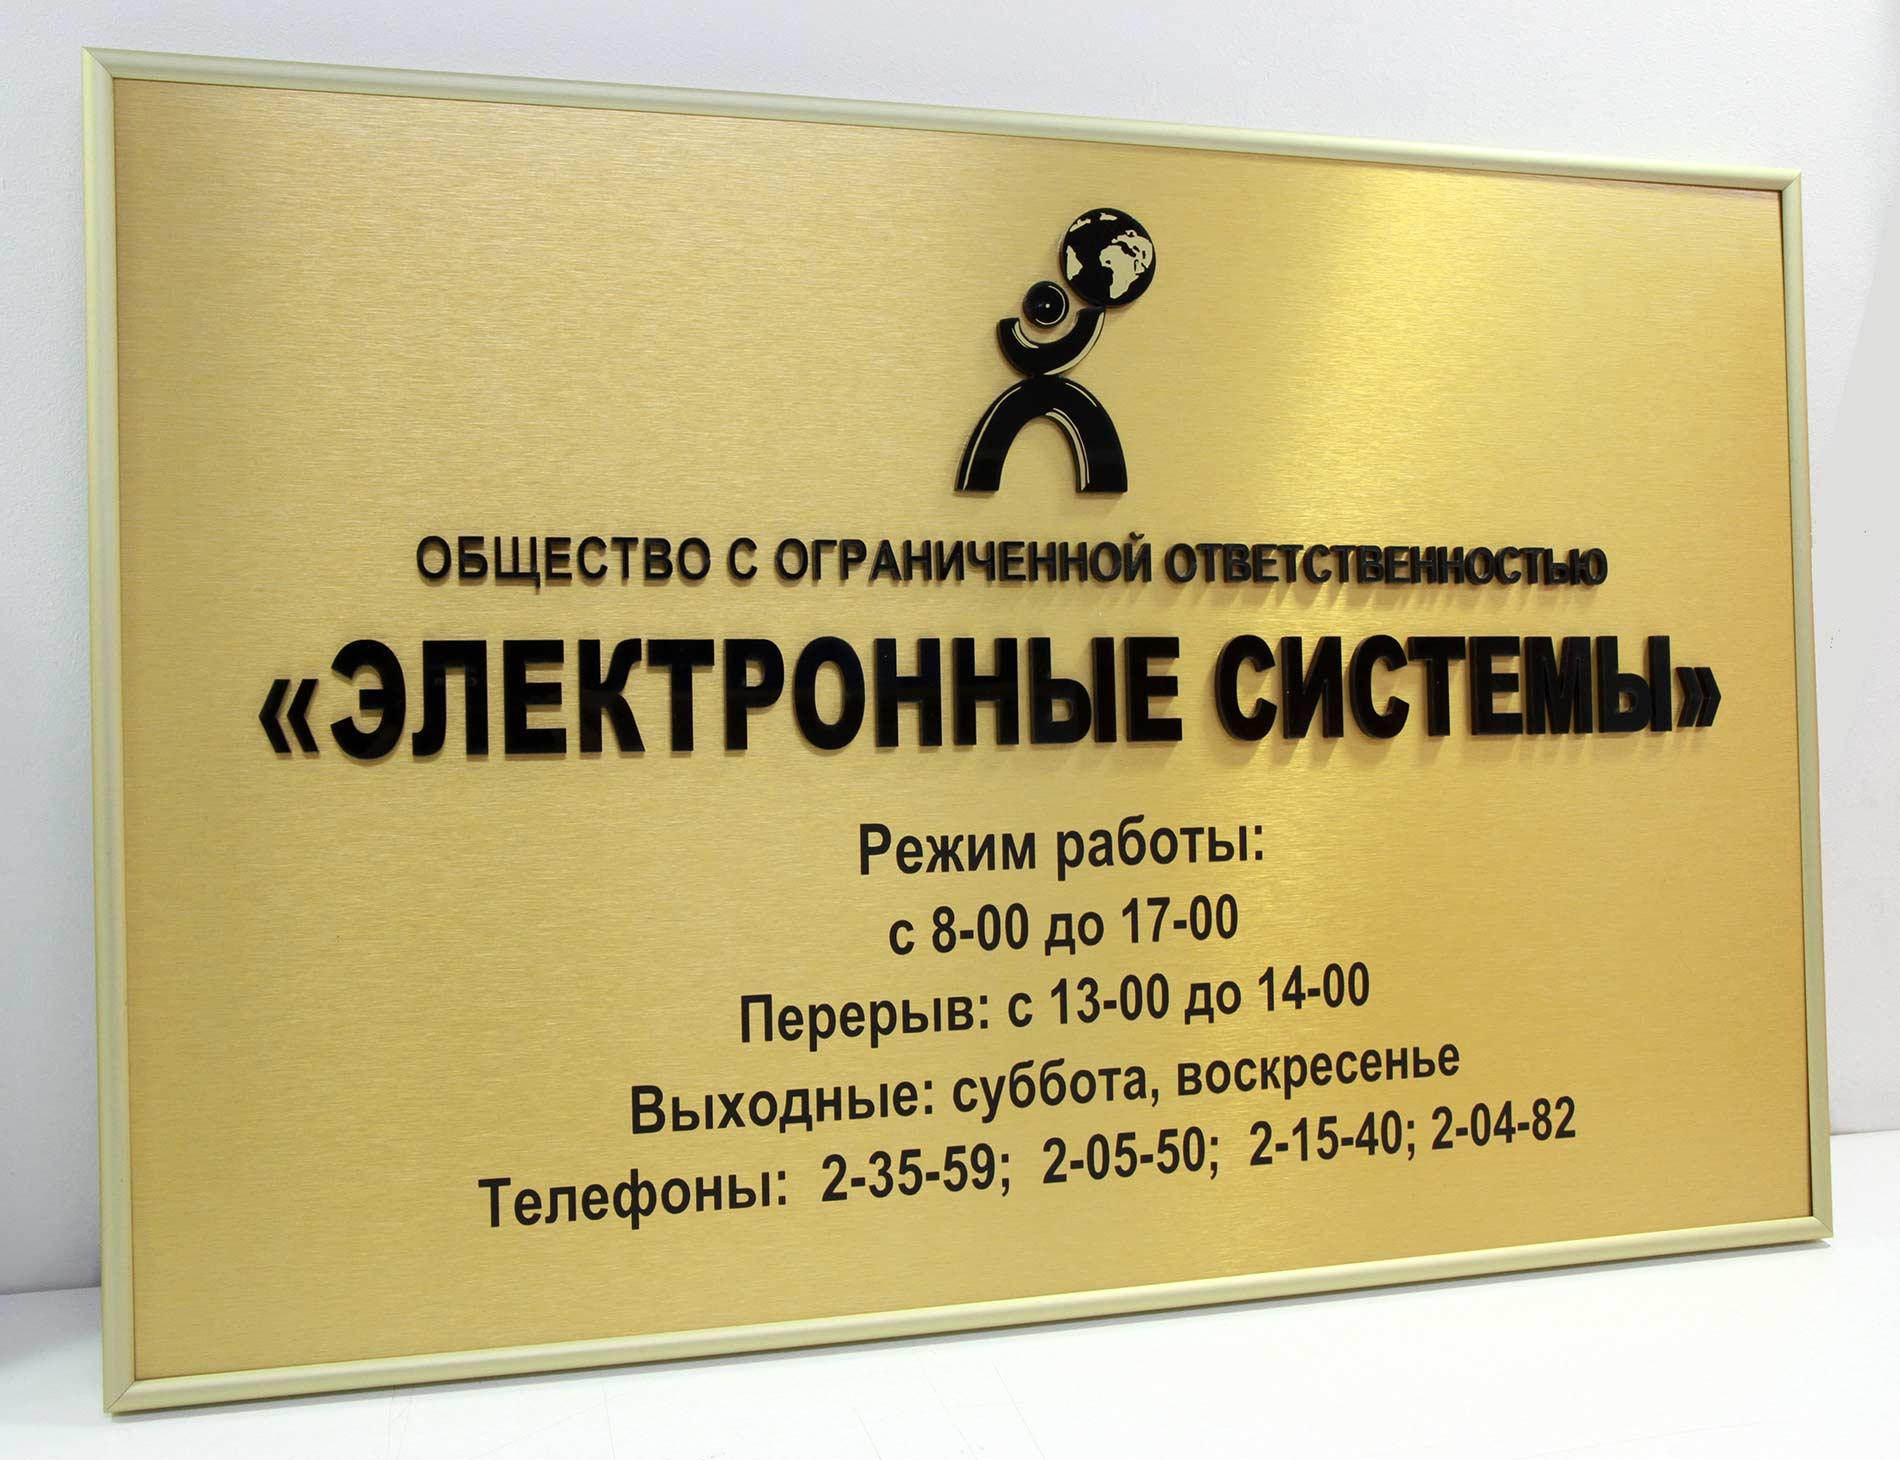 Табличка из металлопластика с объемными буквами